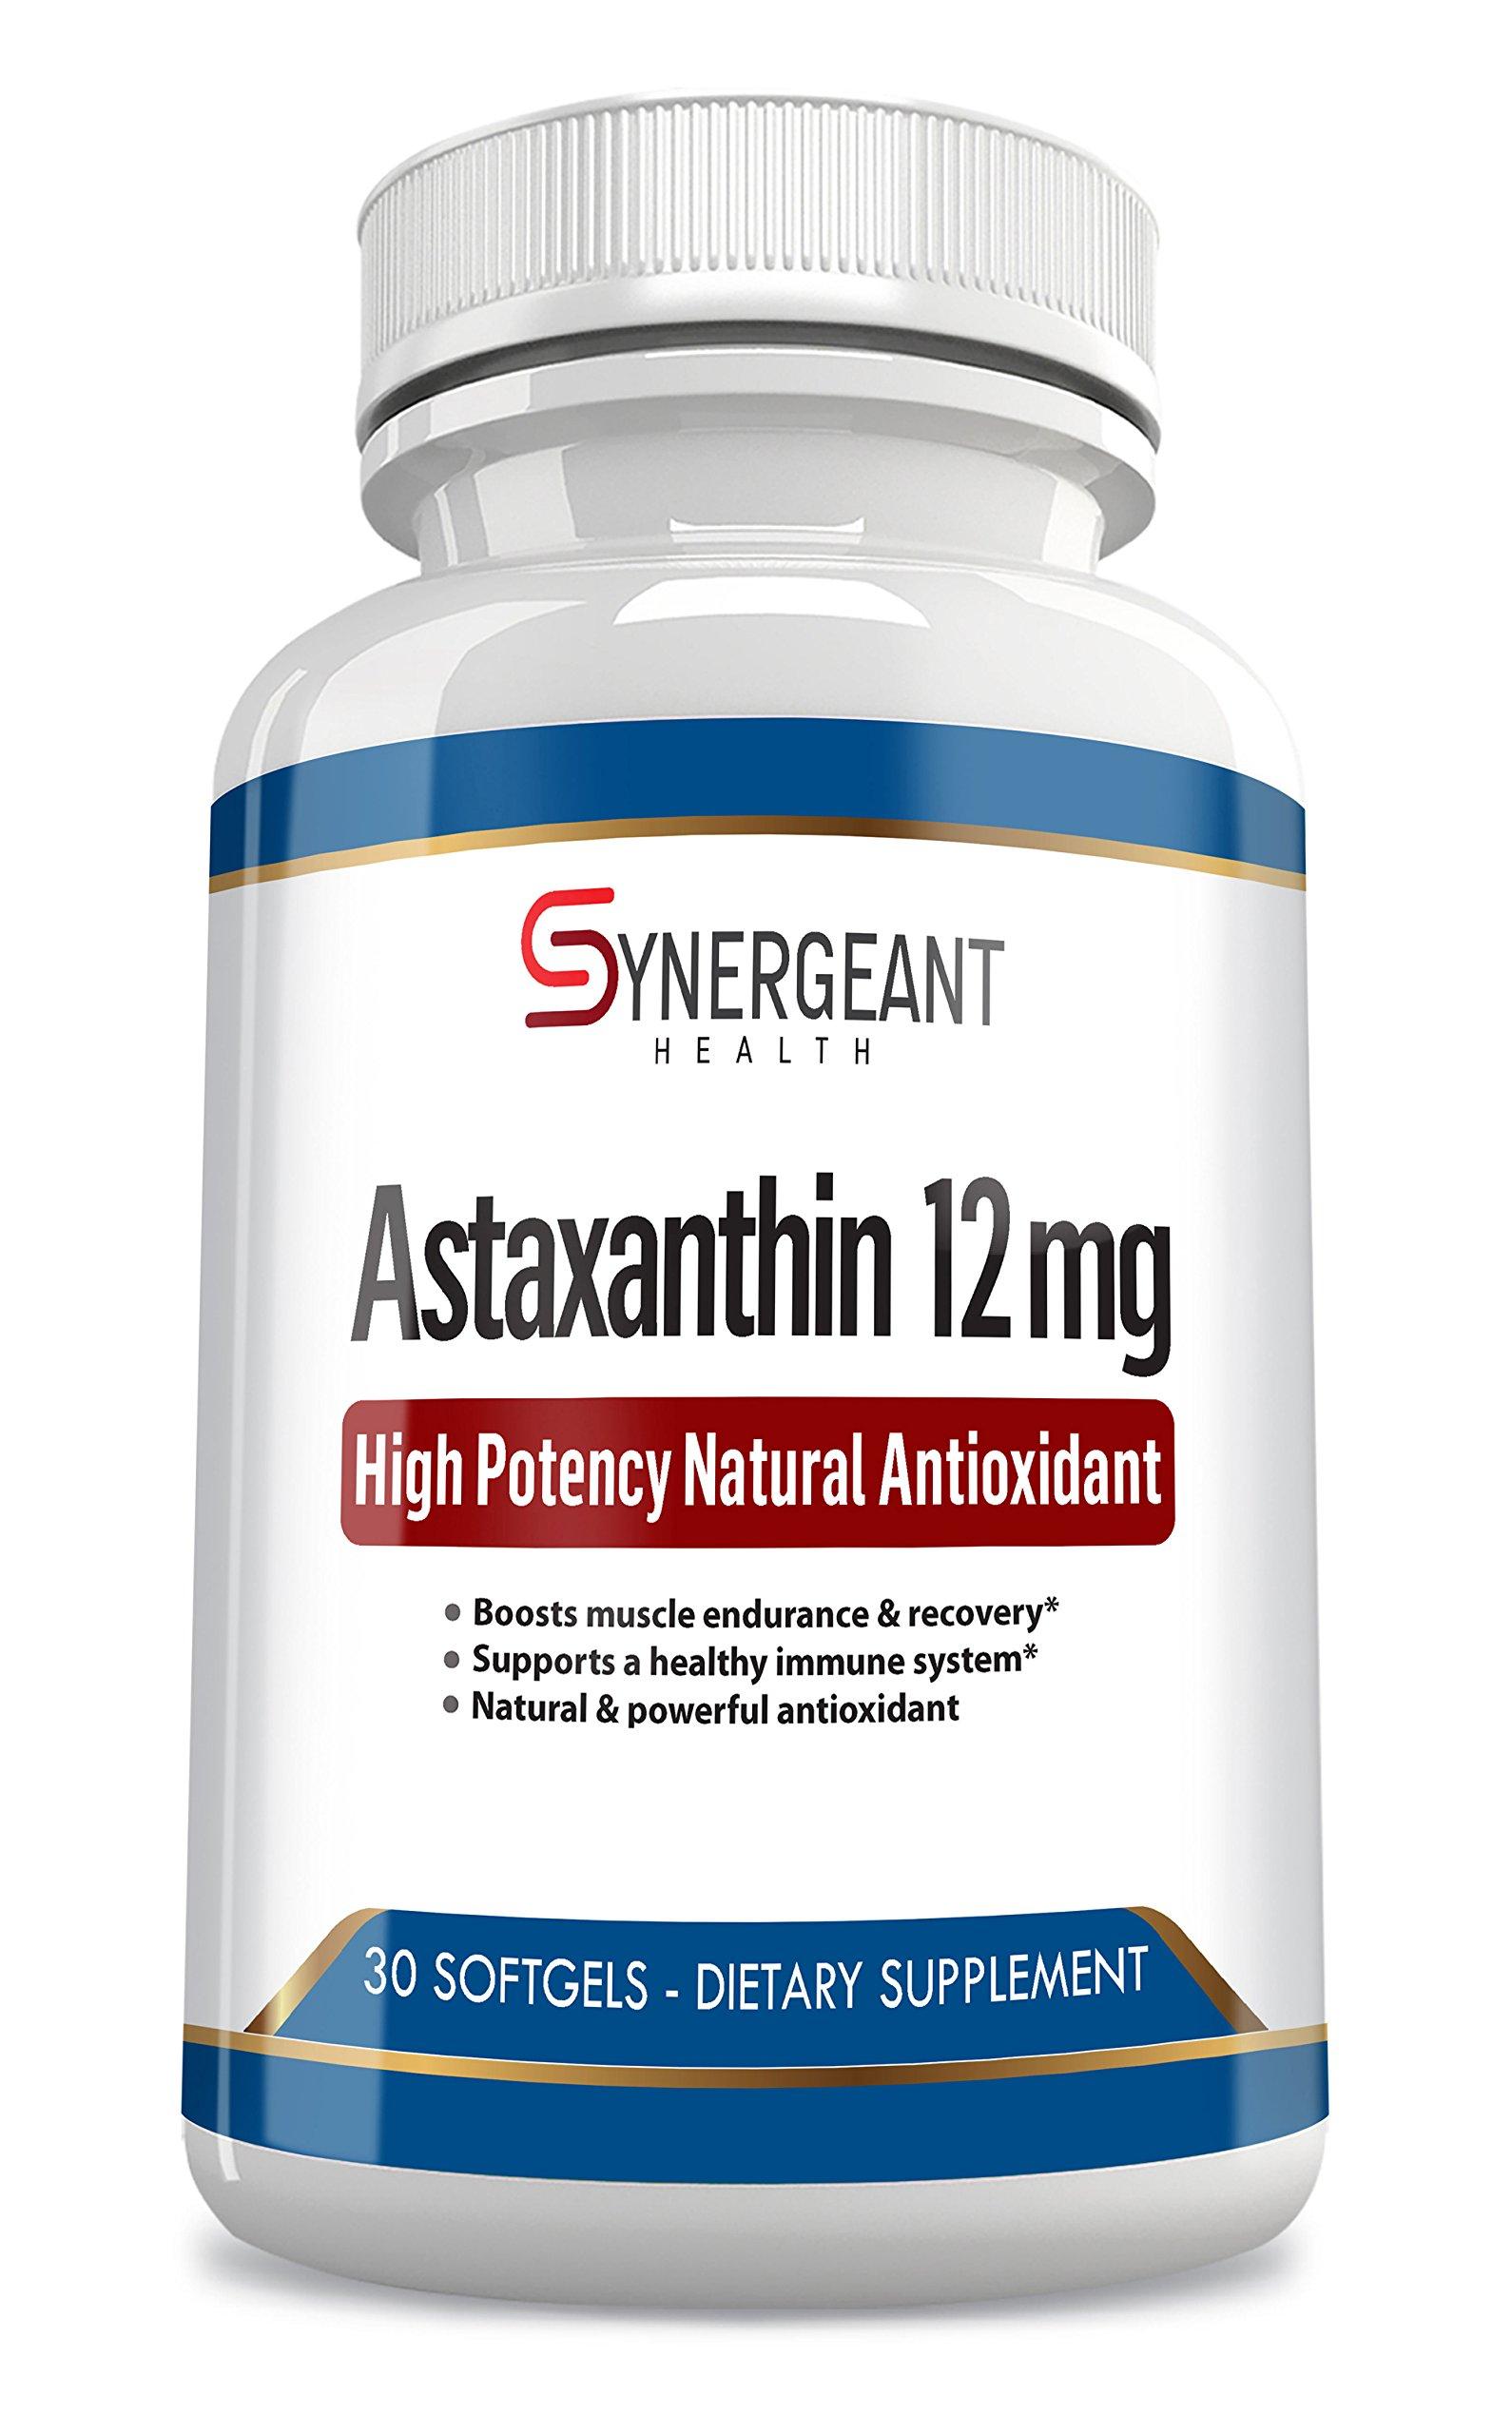 High Potency Astaxanthin 12 mg Natural Antioxidant 30 Softgels